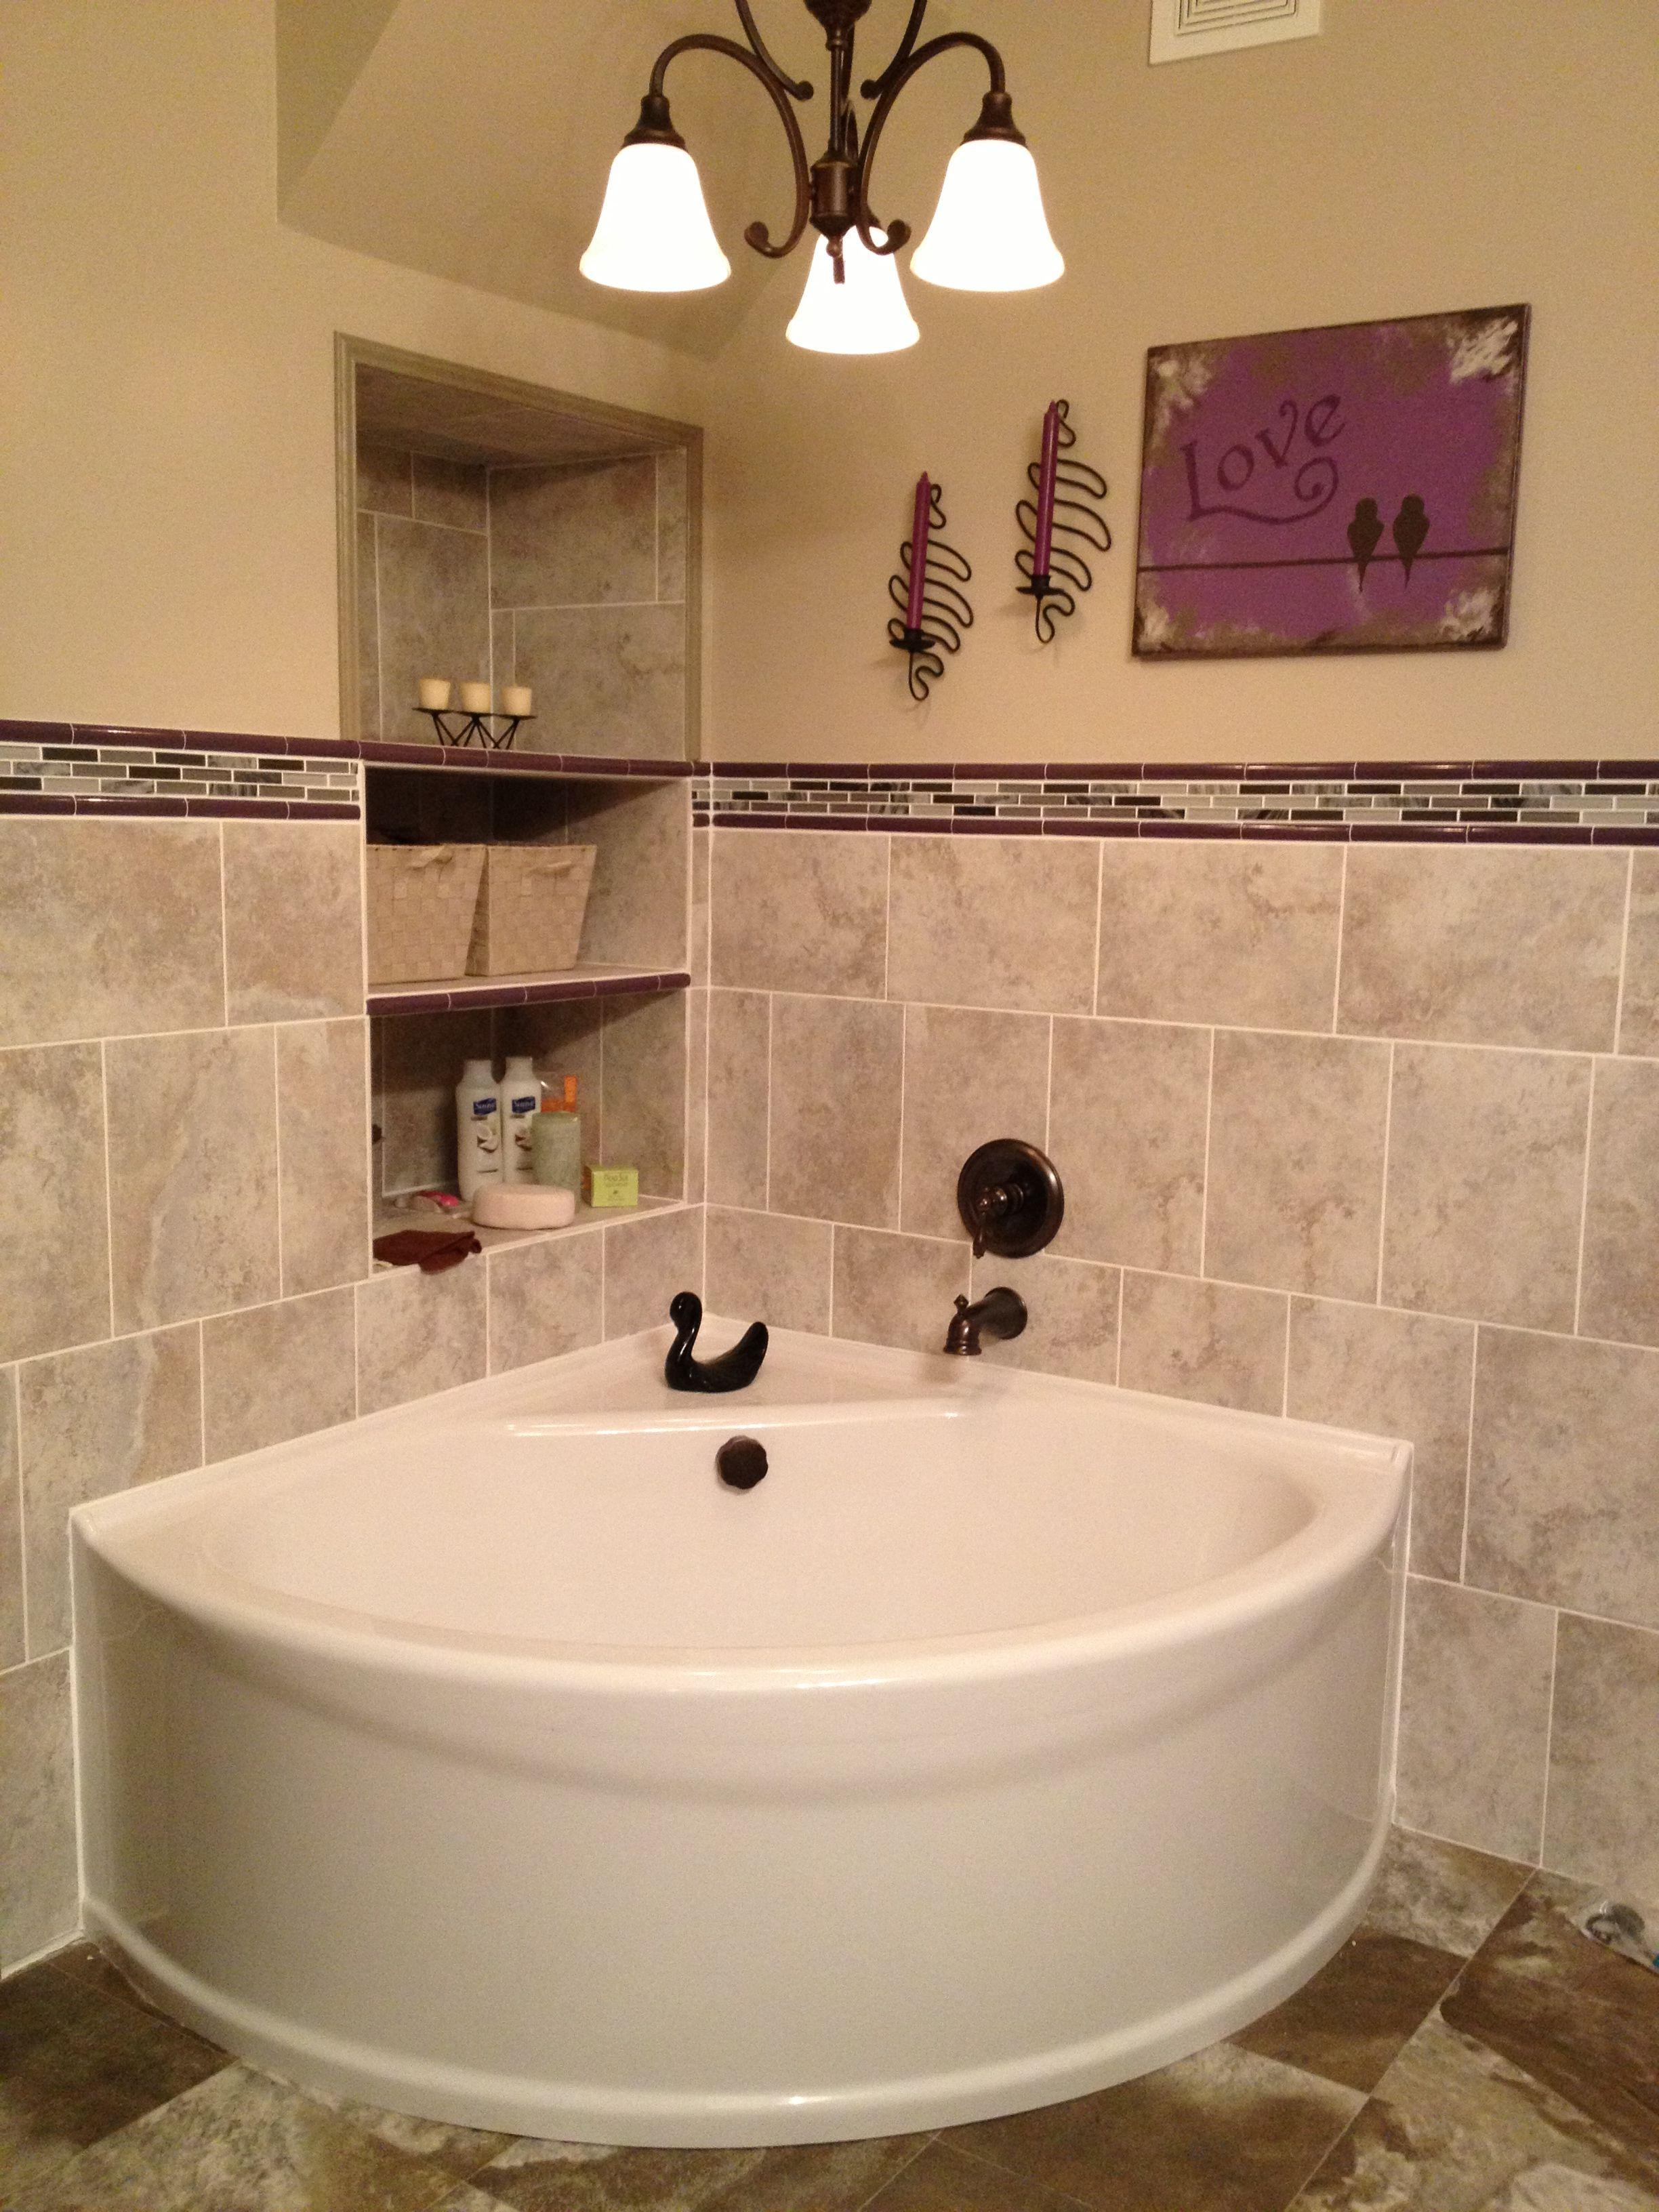 Romantic bathtub   Bathroom   Romantic bathtubs, Bathtub ...